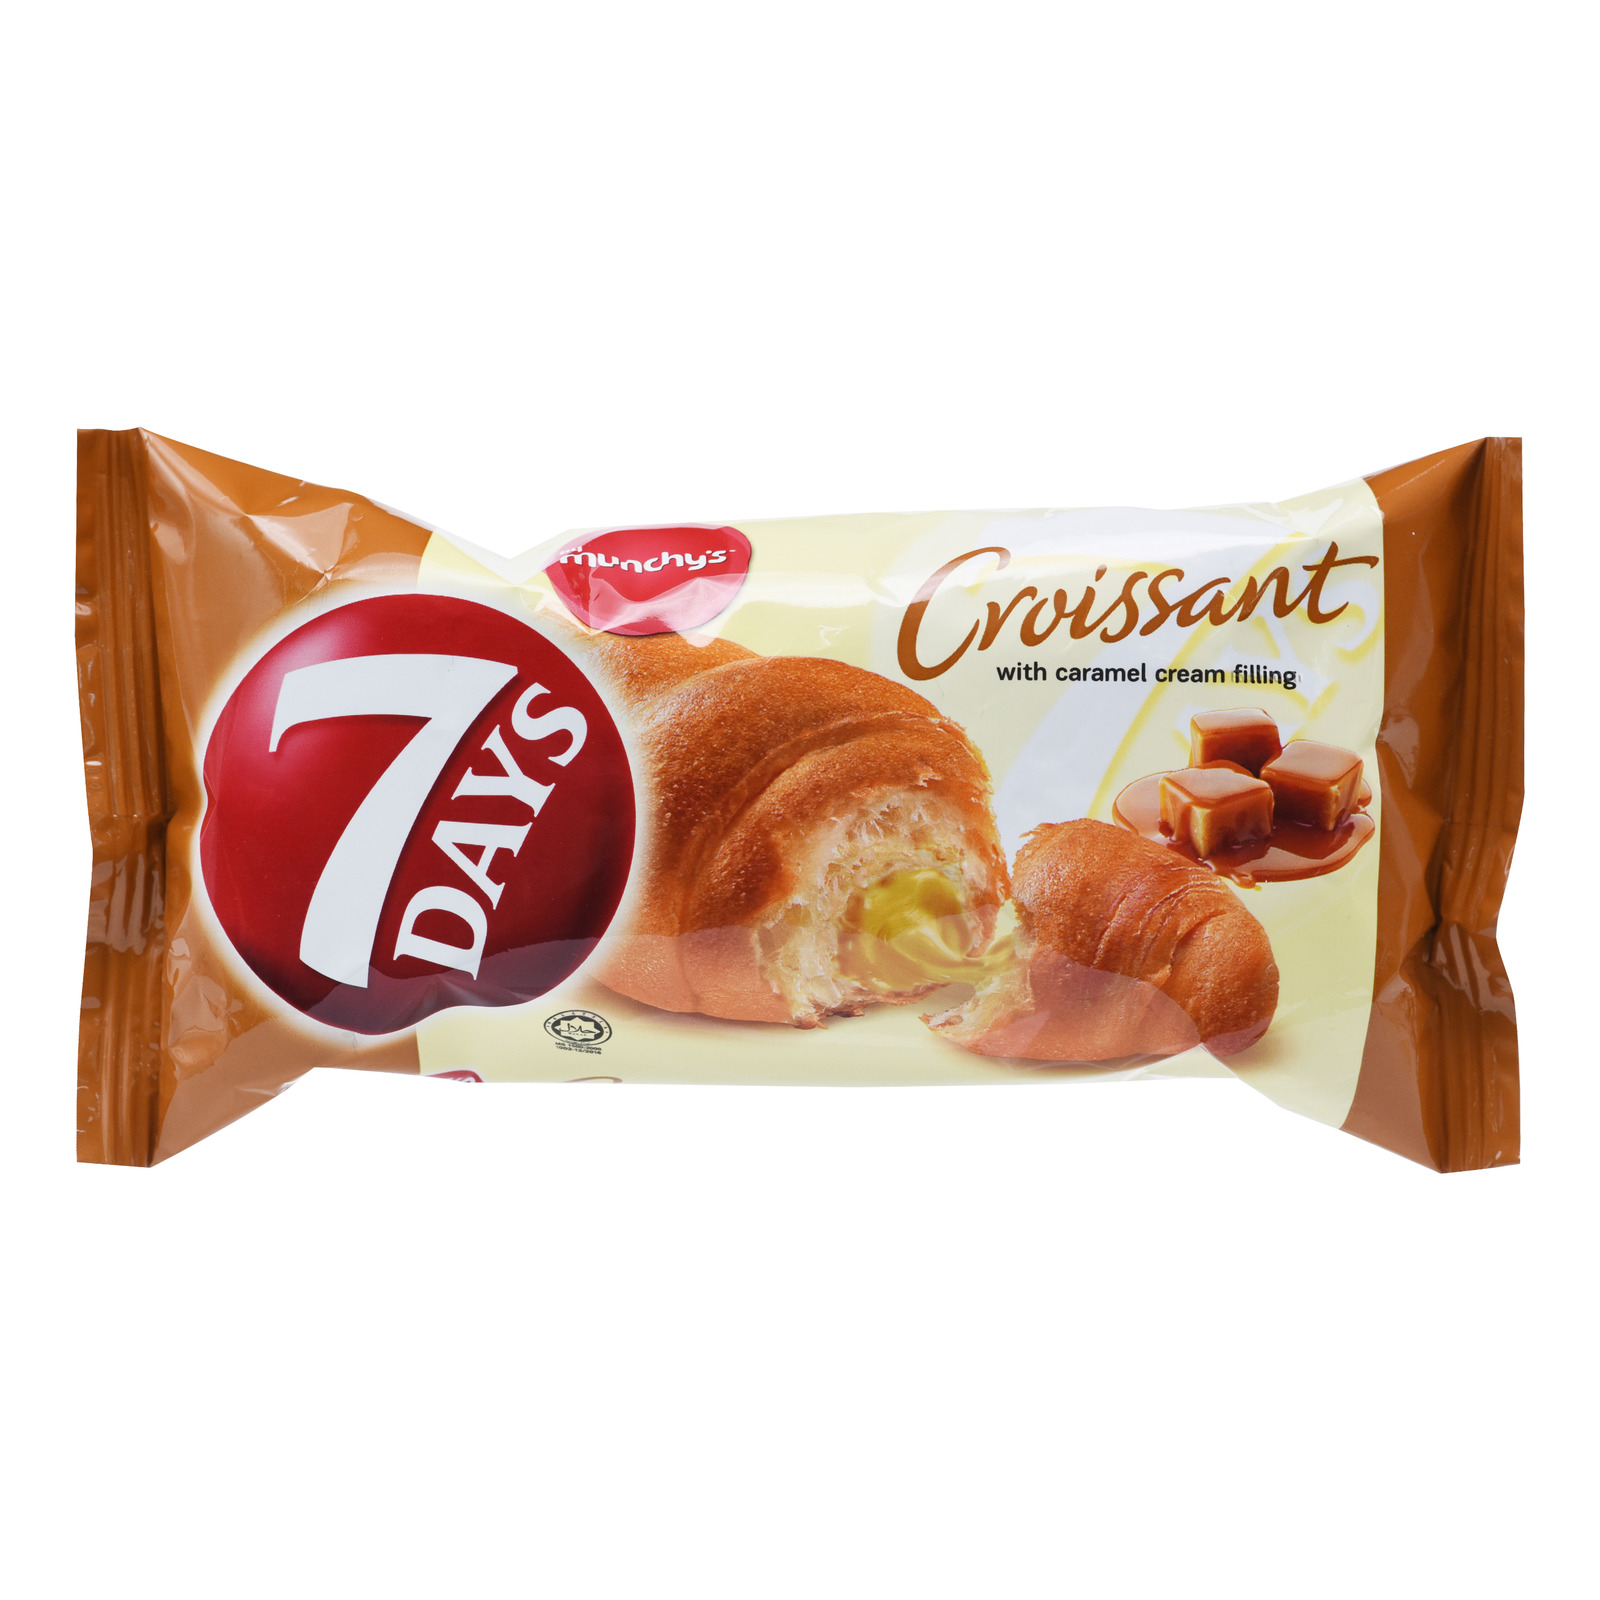 Munchy's 7 Days Croissant Cream Bun - Caramel